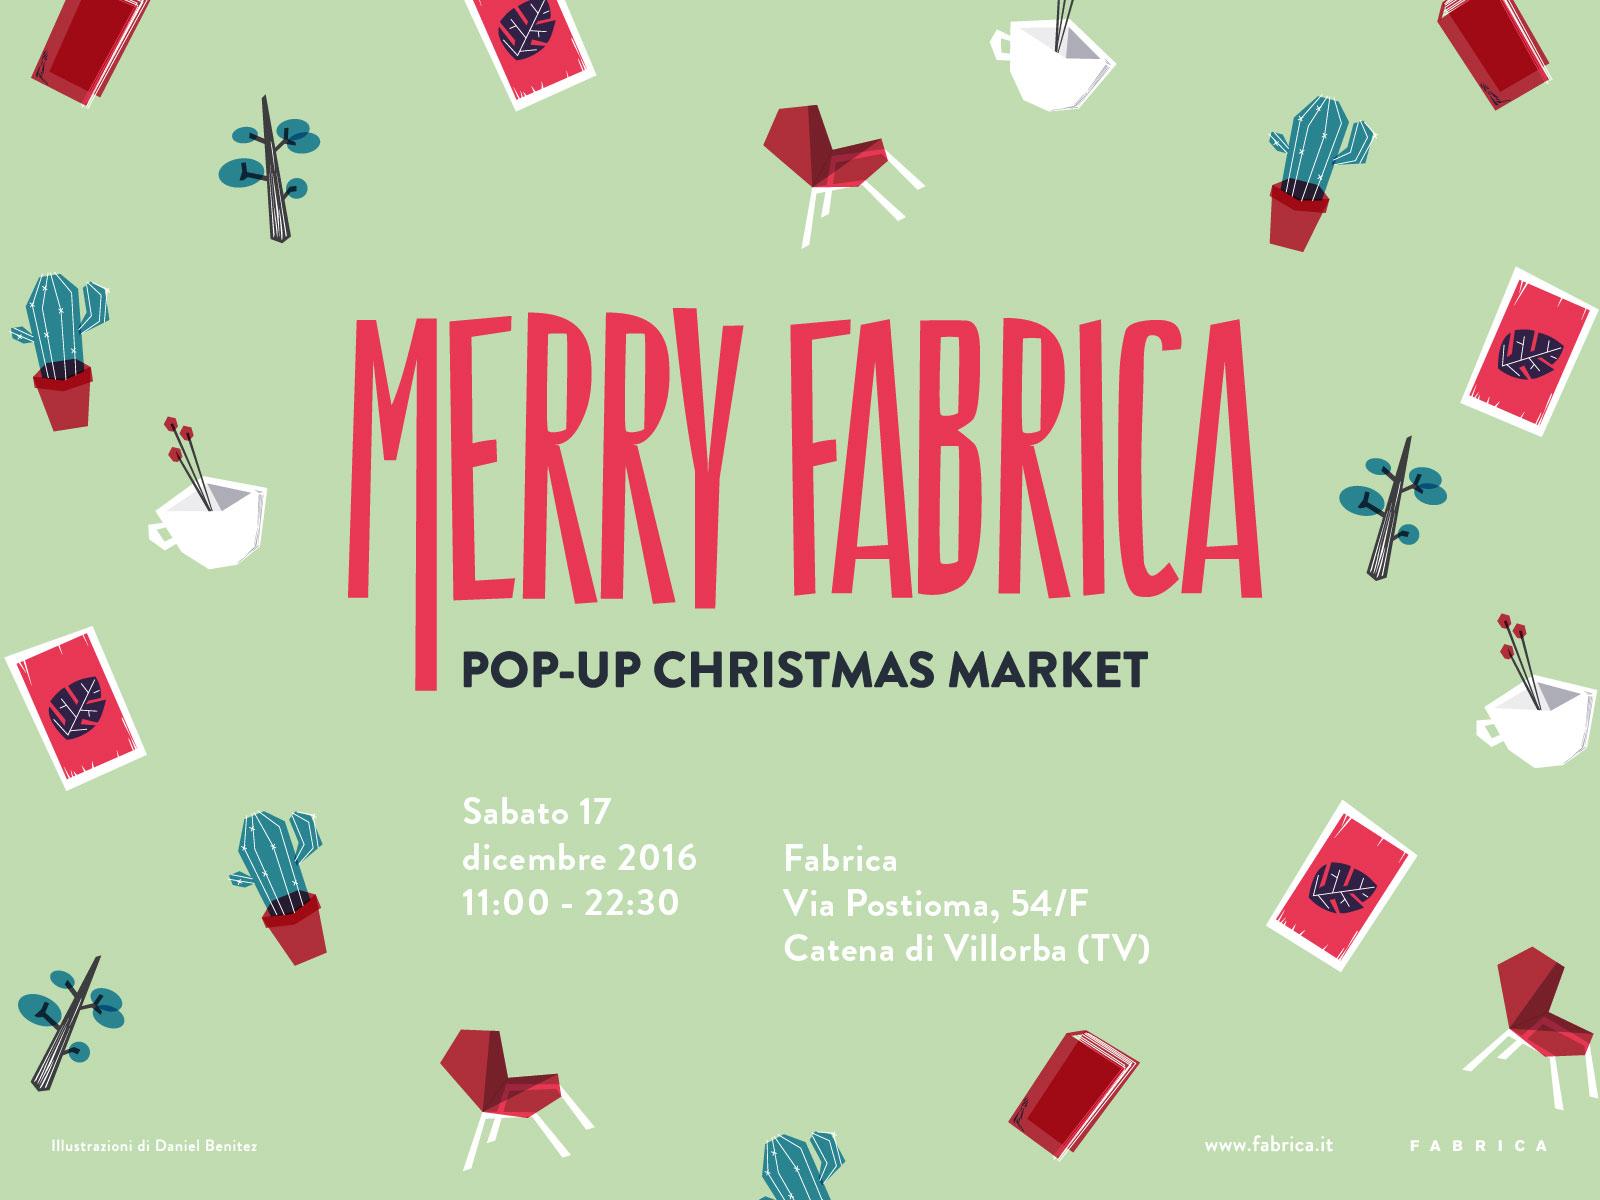 merryfabrica_website